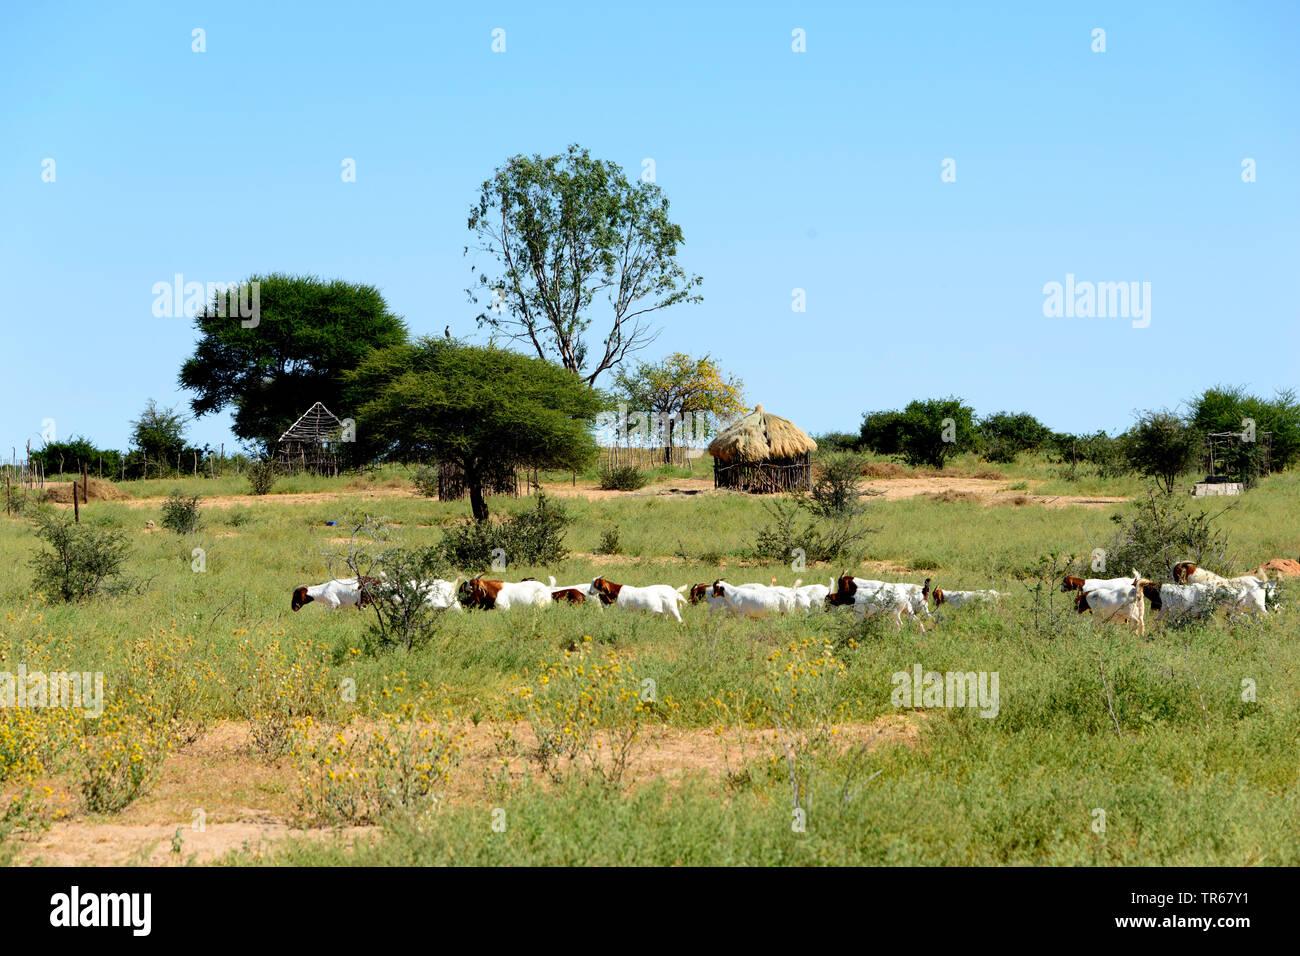 domestic goat (Capra hircus, Capra aegagrus f. hircus), herd of goats in savanna in front of traditional hut, Botswana, Kuke - Stock Image